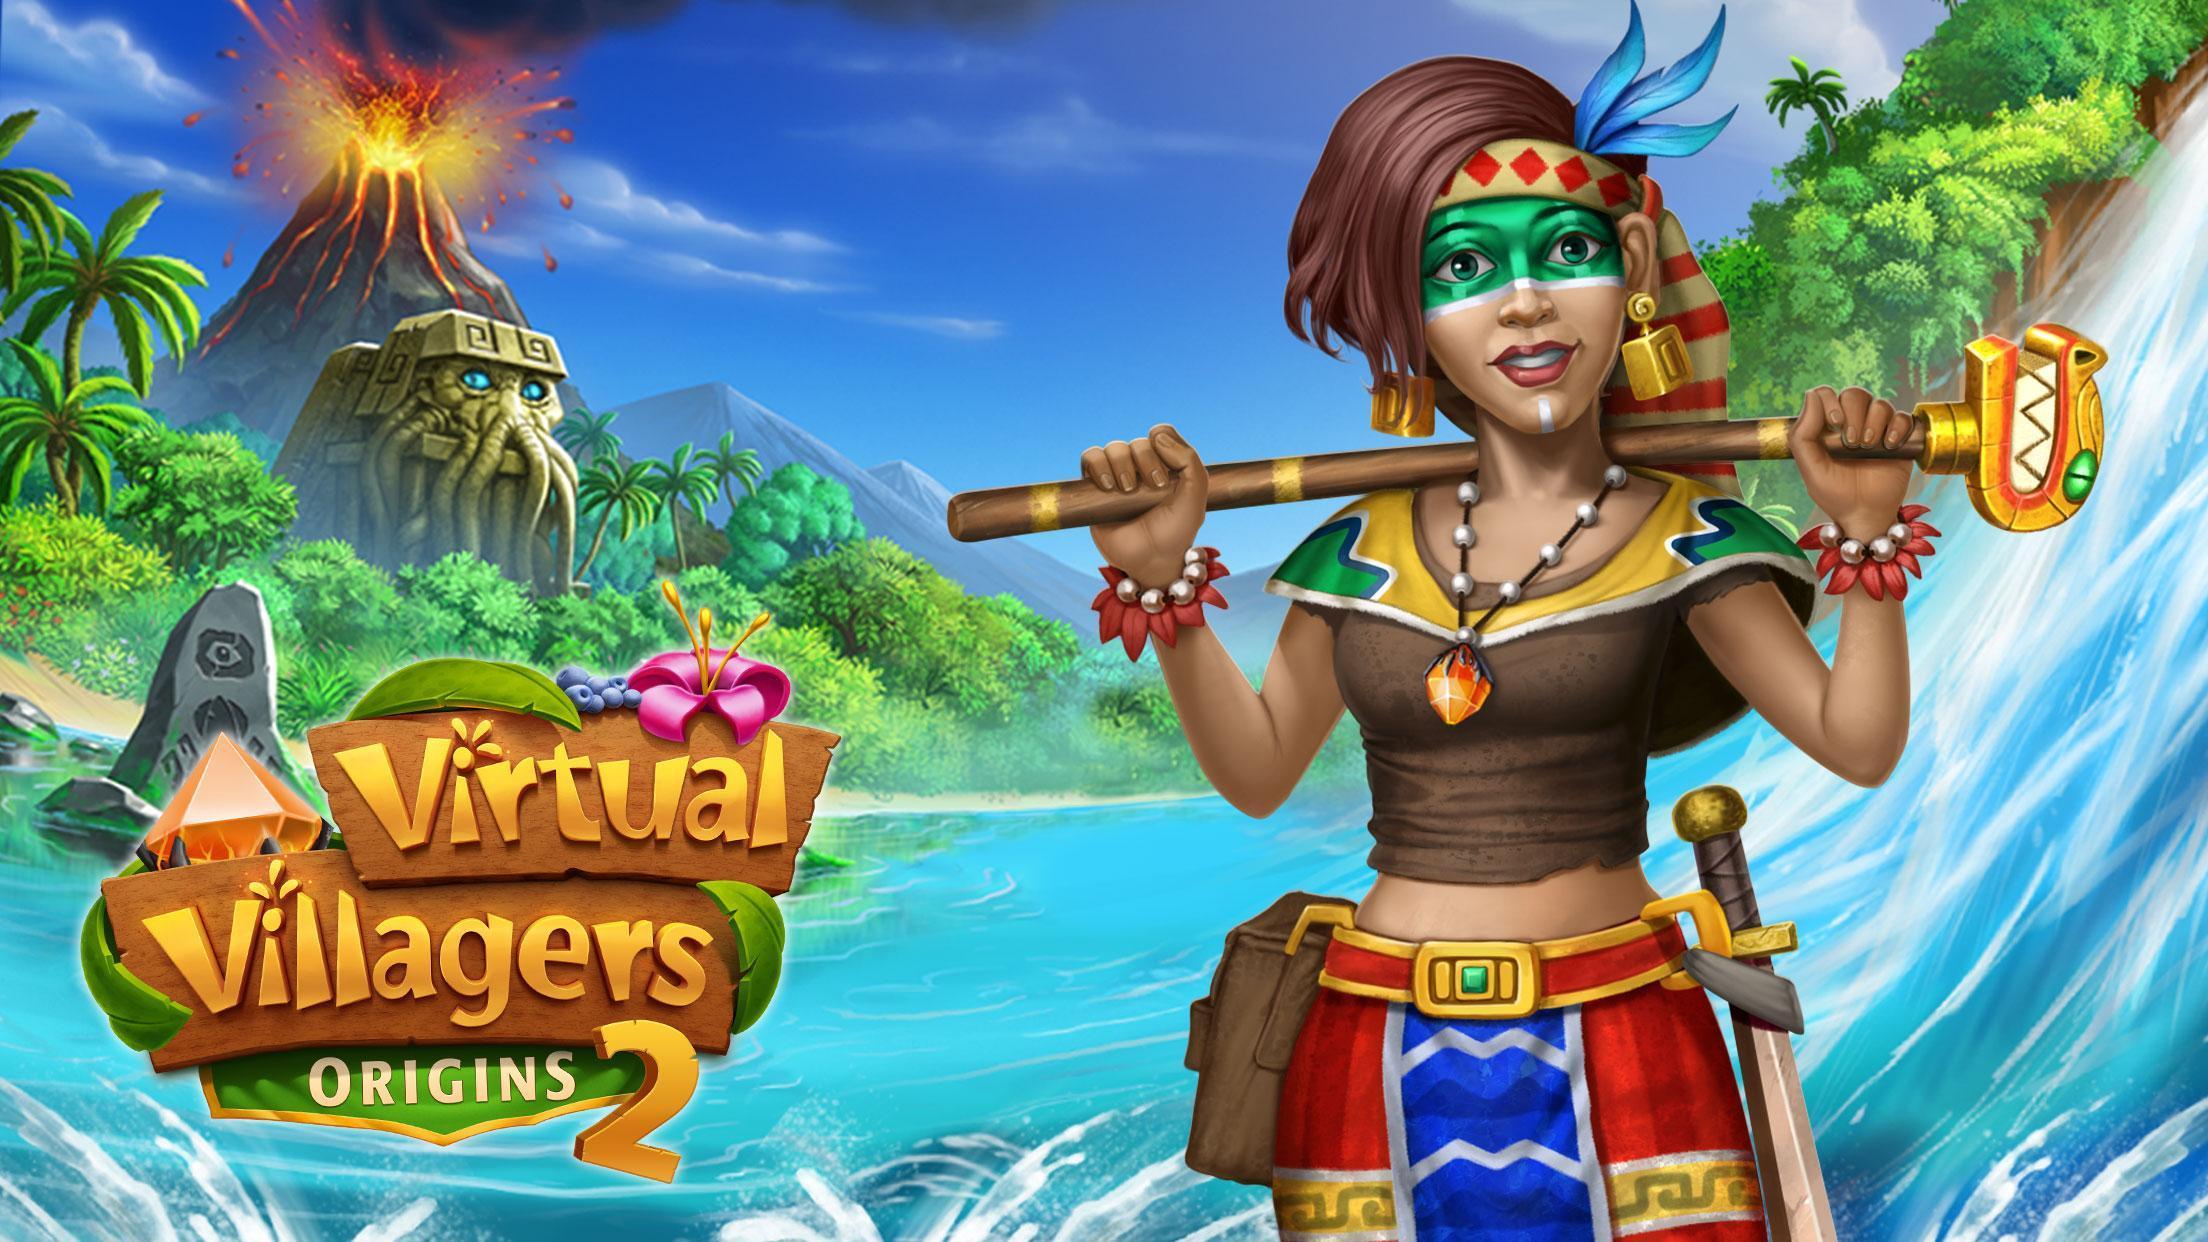 Virtual villagers origins 2 | virtual villagers pc game.